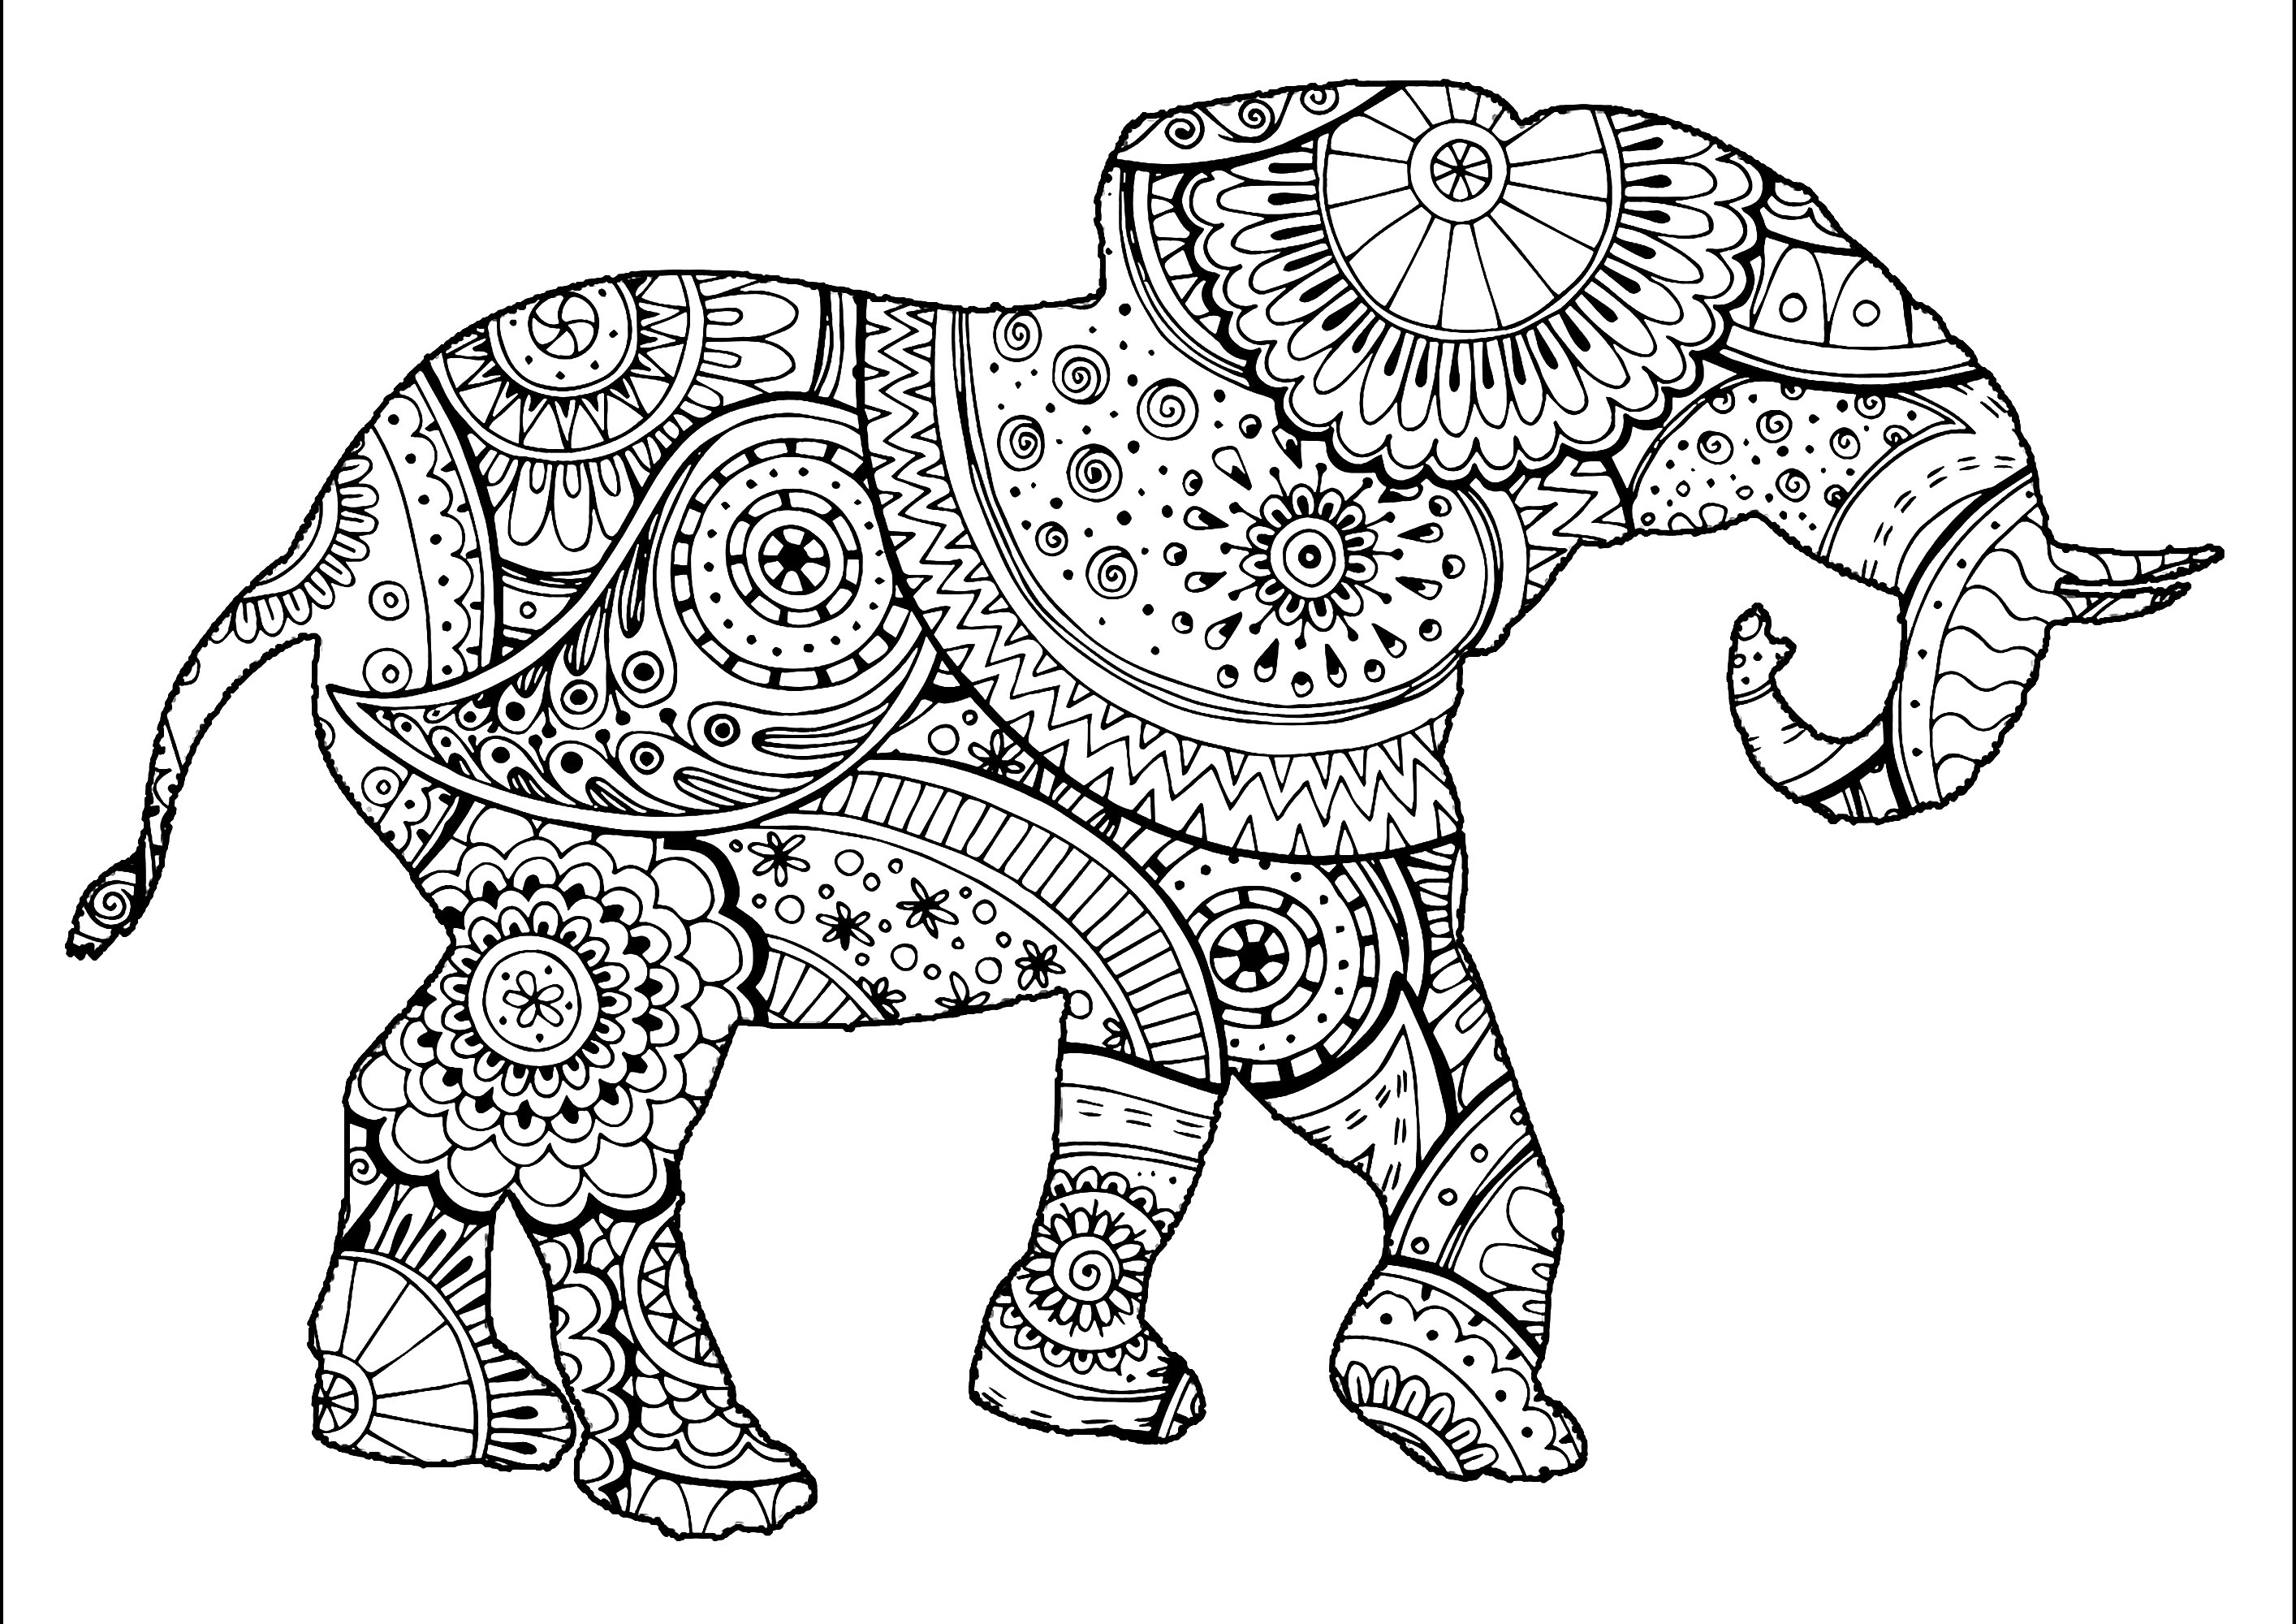 Malvorlage erwachsene elefant - 28 images - ausmalbilder f